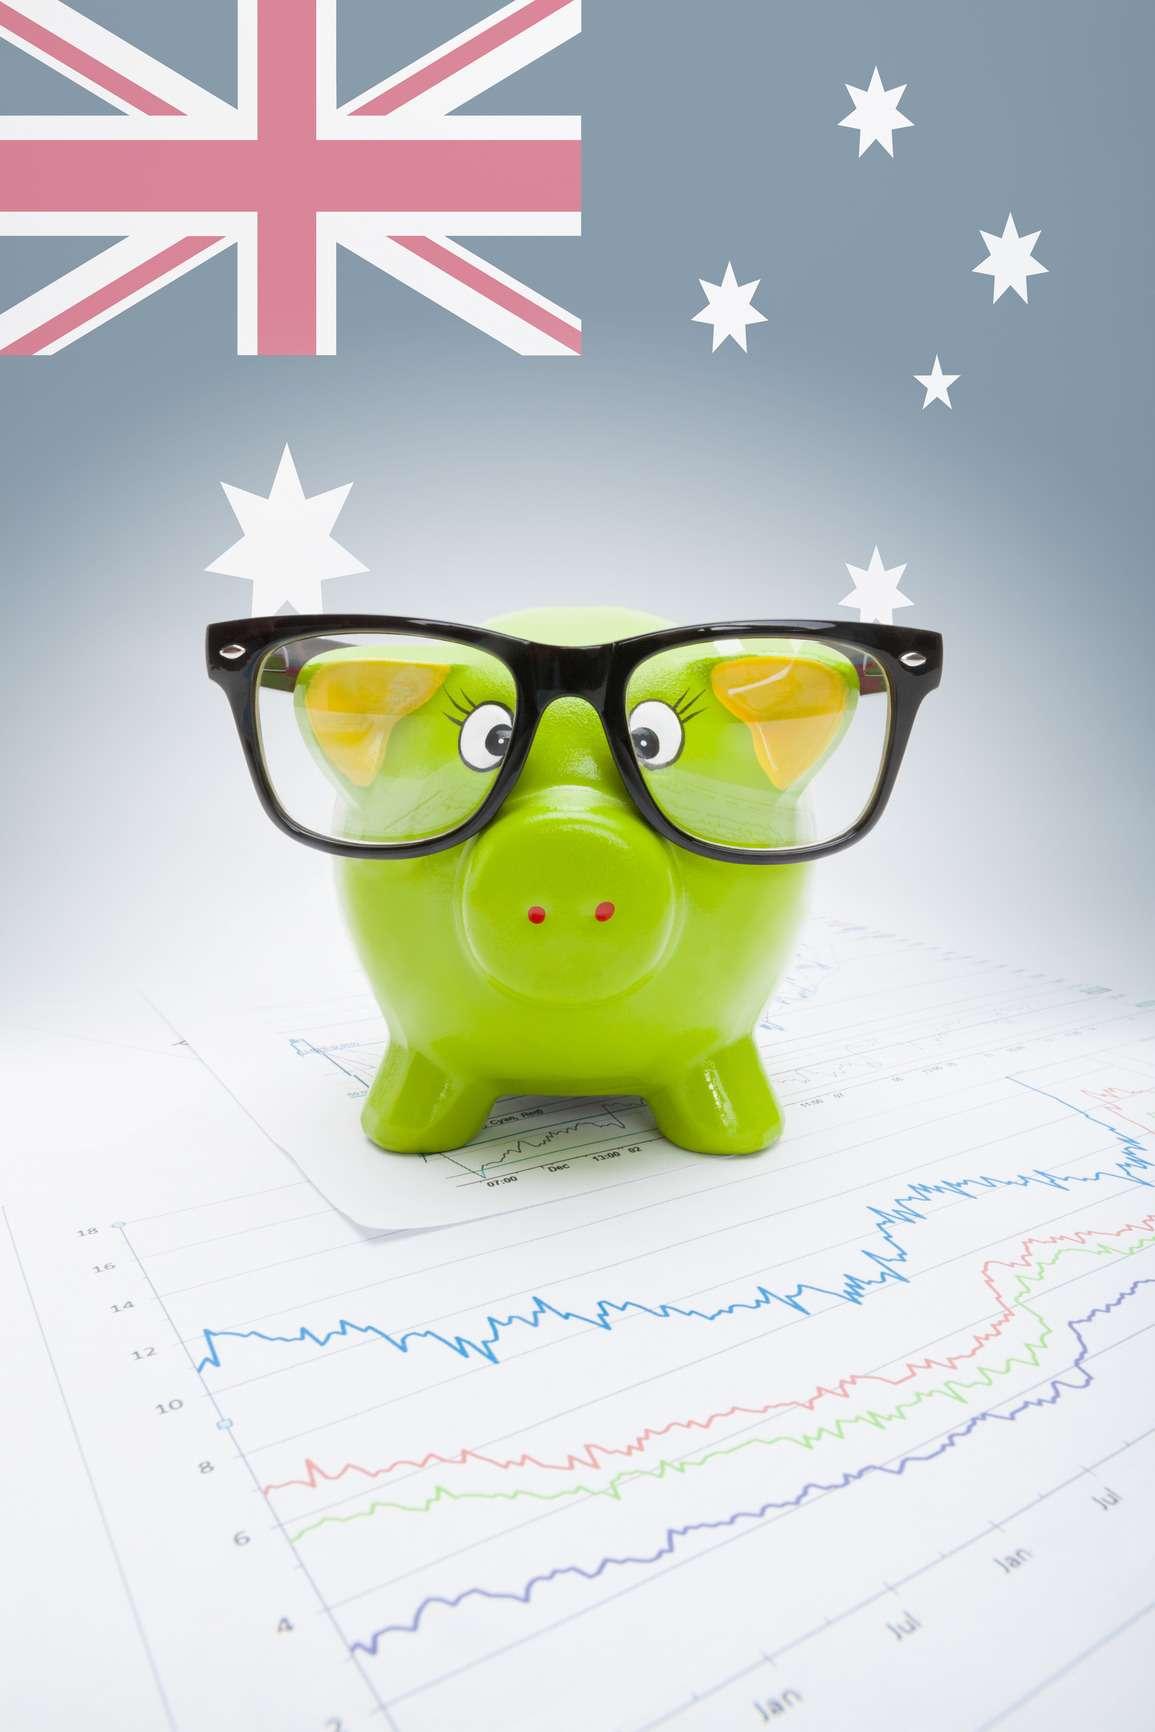 Piggy bank with flag on background - Australia